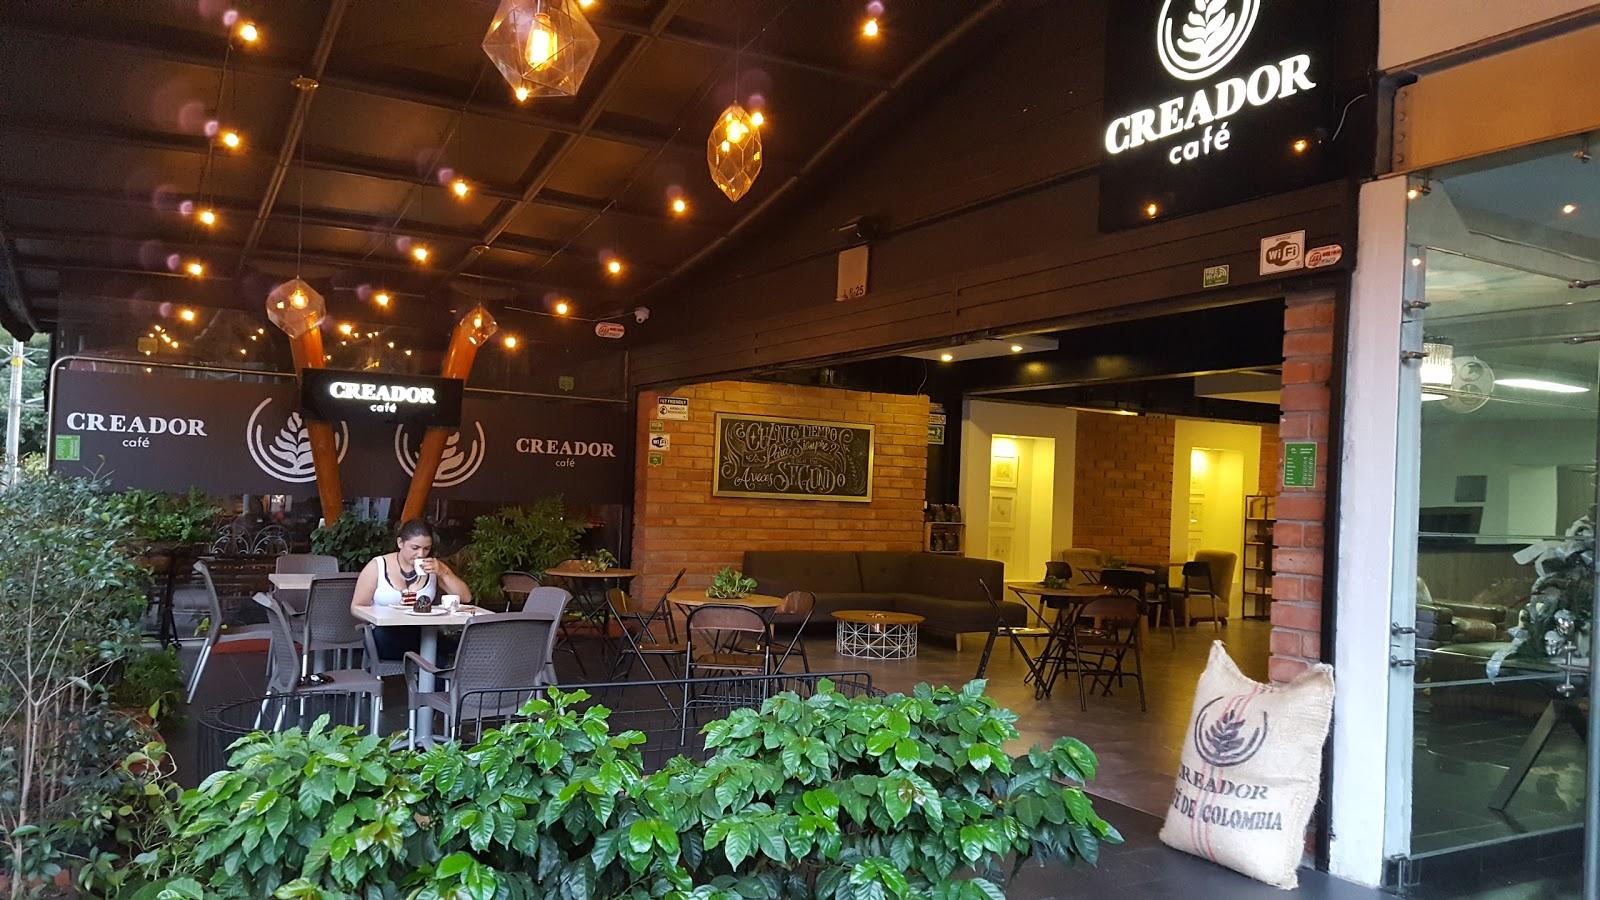 Creador: A Work-Friendly Place in Medellin